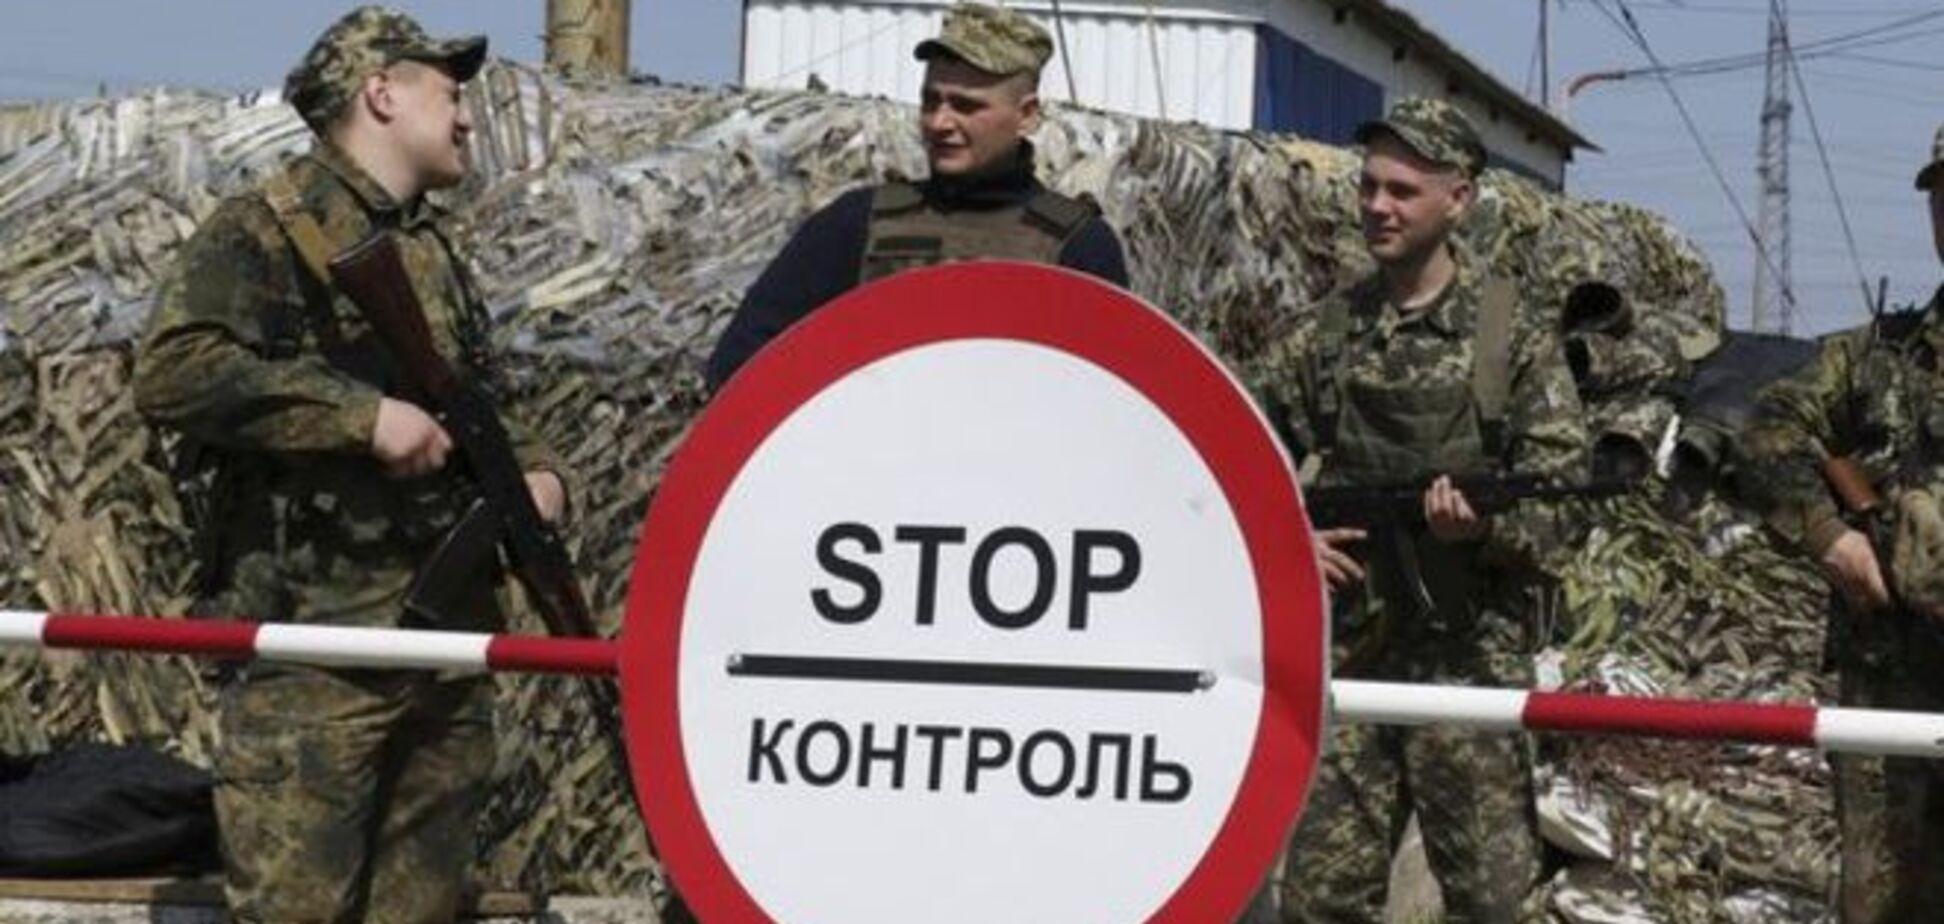 Бойцы АТО отбили атаку двух групп пехоты на Марьинку